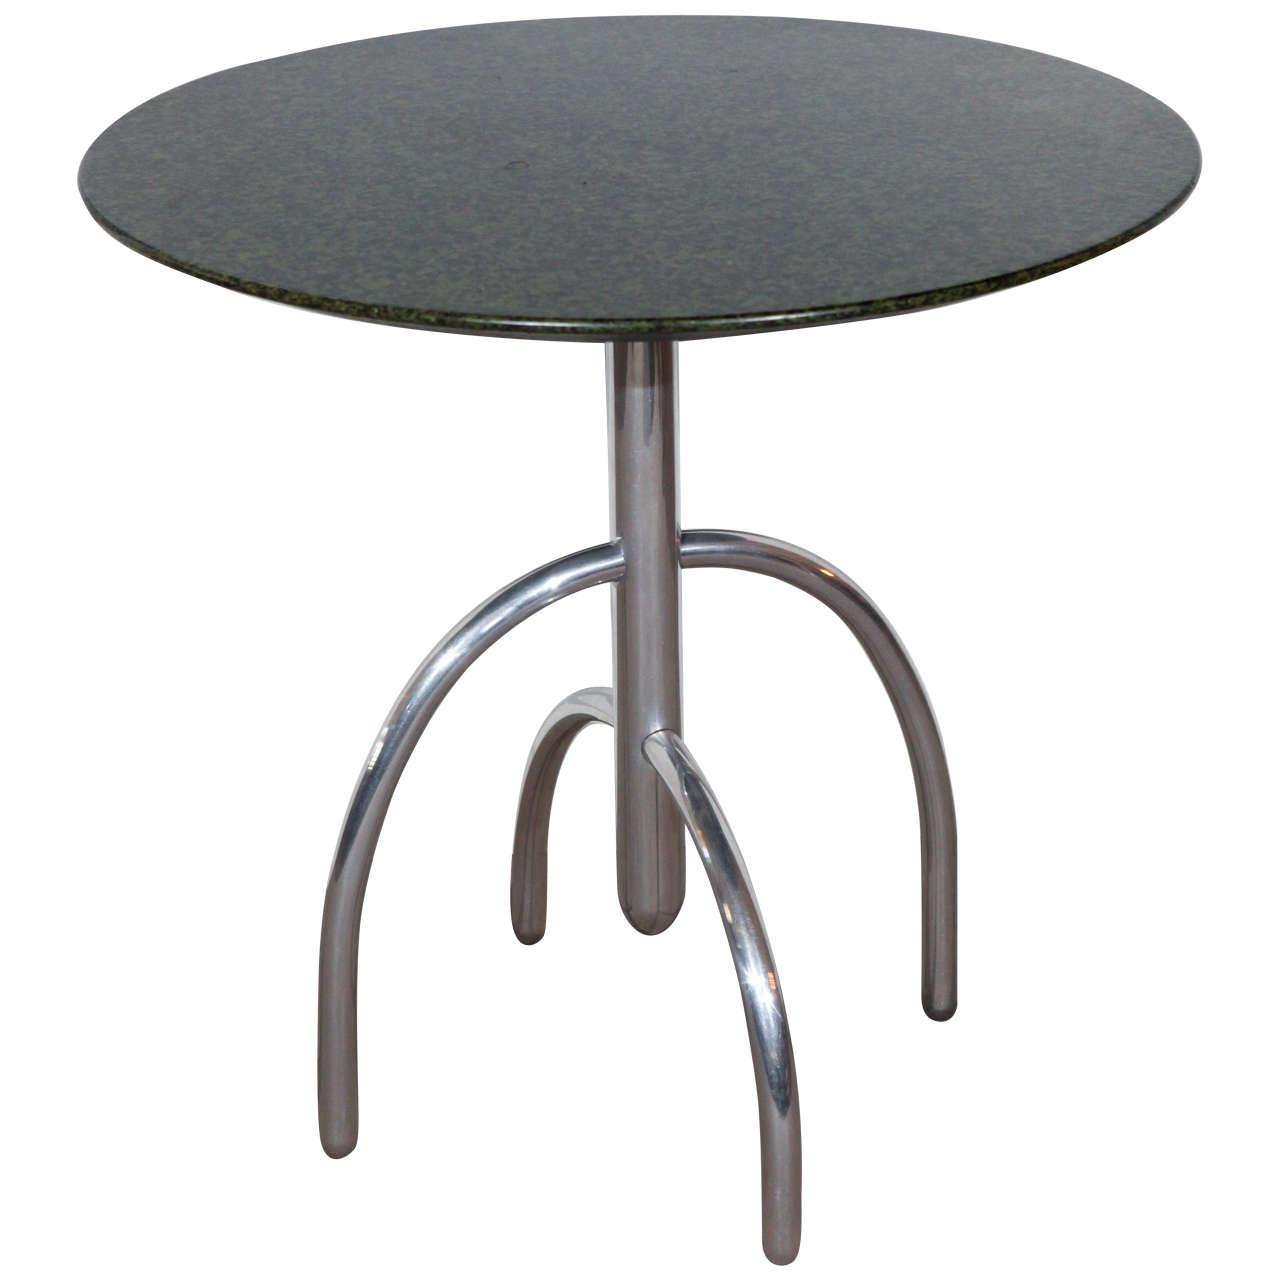 "Lawrence Laske ""Saguaro Cactus"" Table"